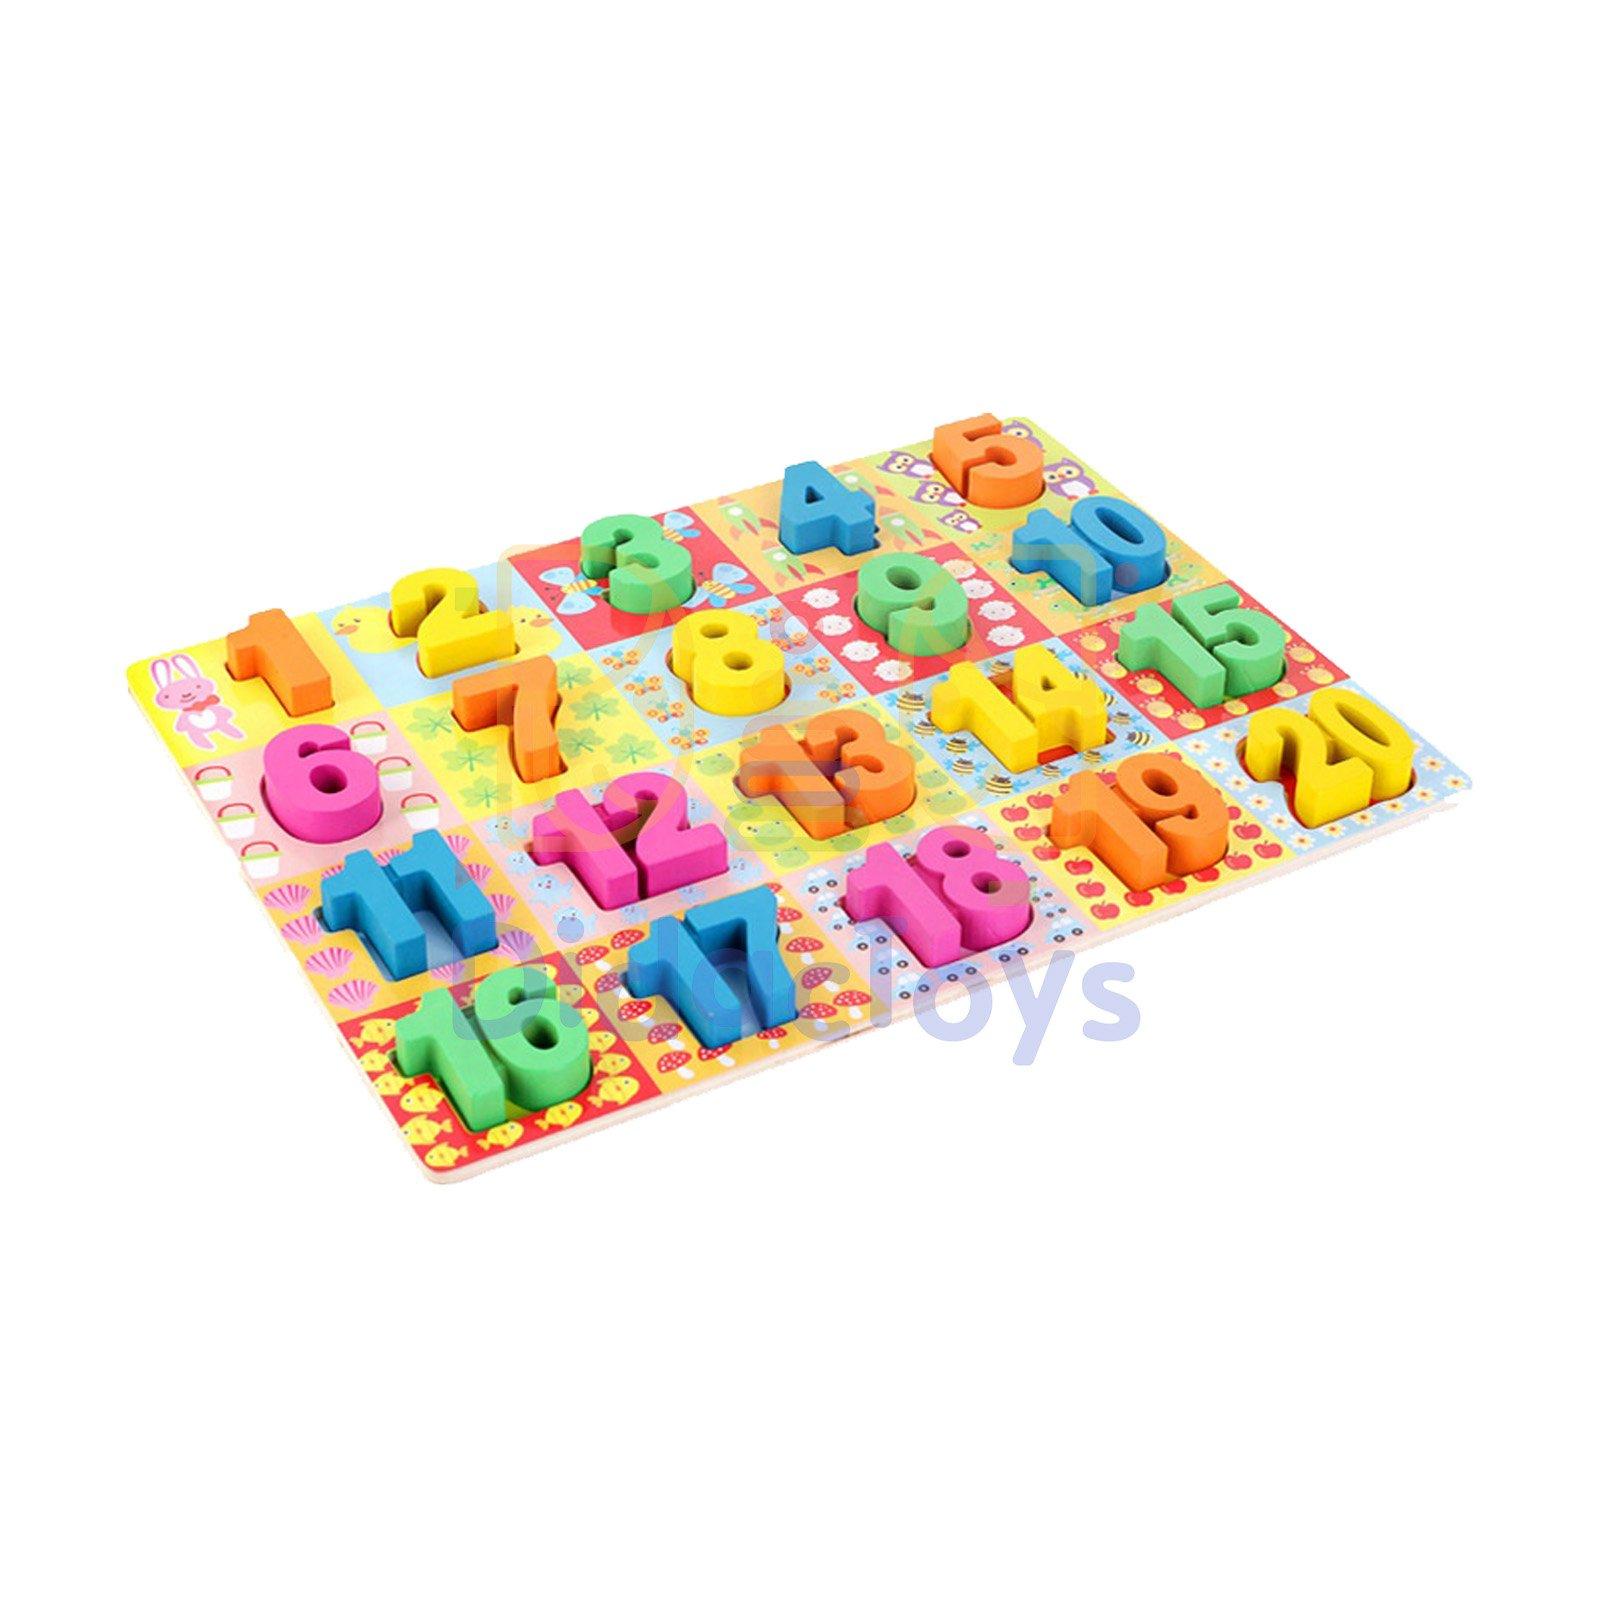 Rompecabezas letras